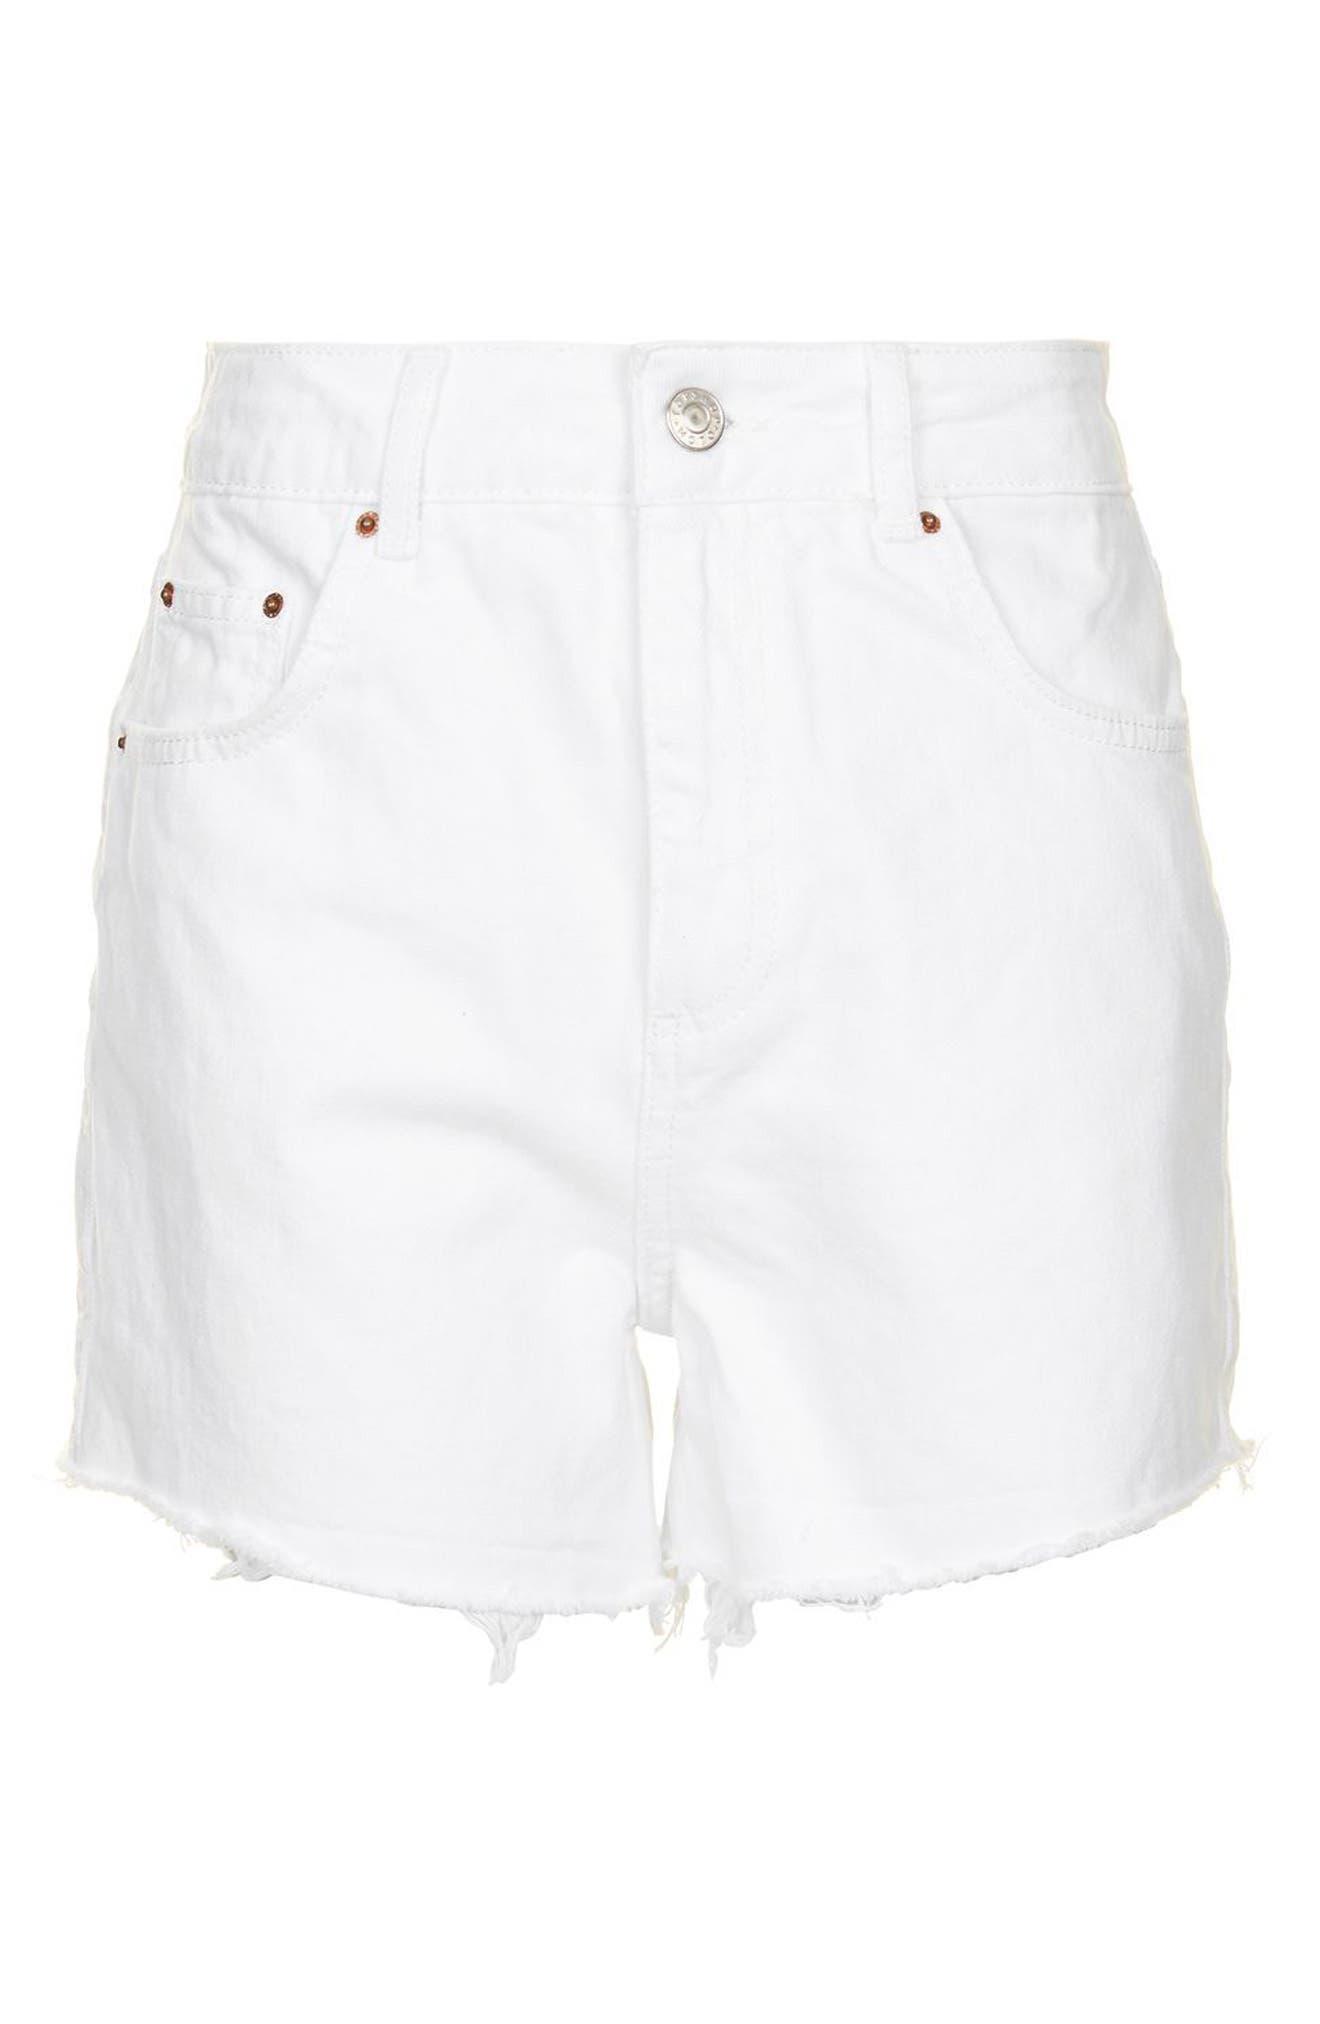 Mom Shorts,                             Alternate thumbnail 4, color,                             White